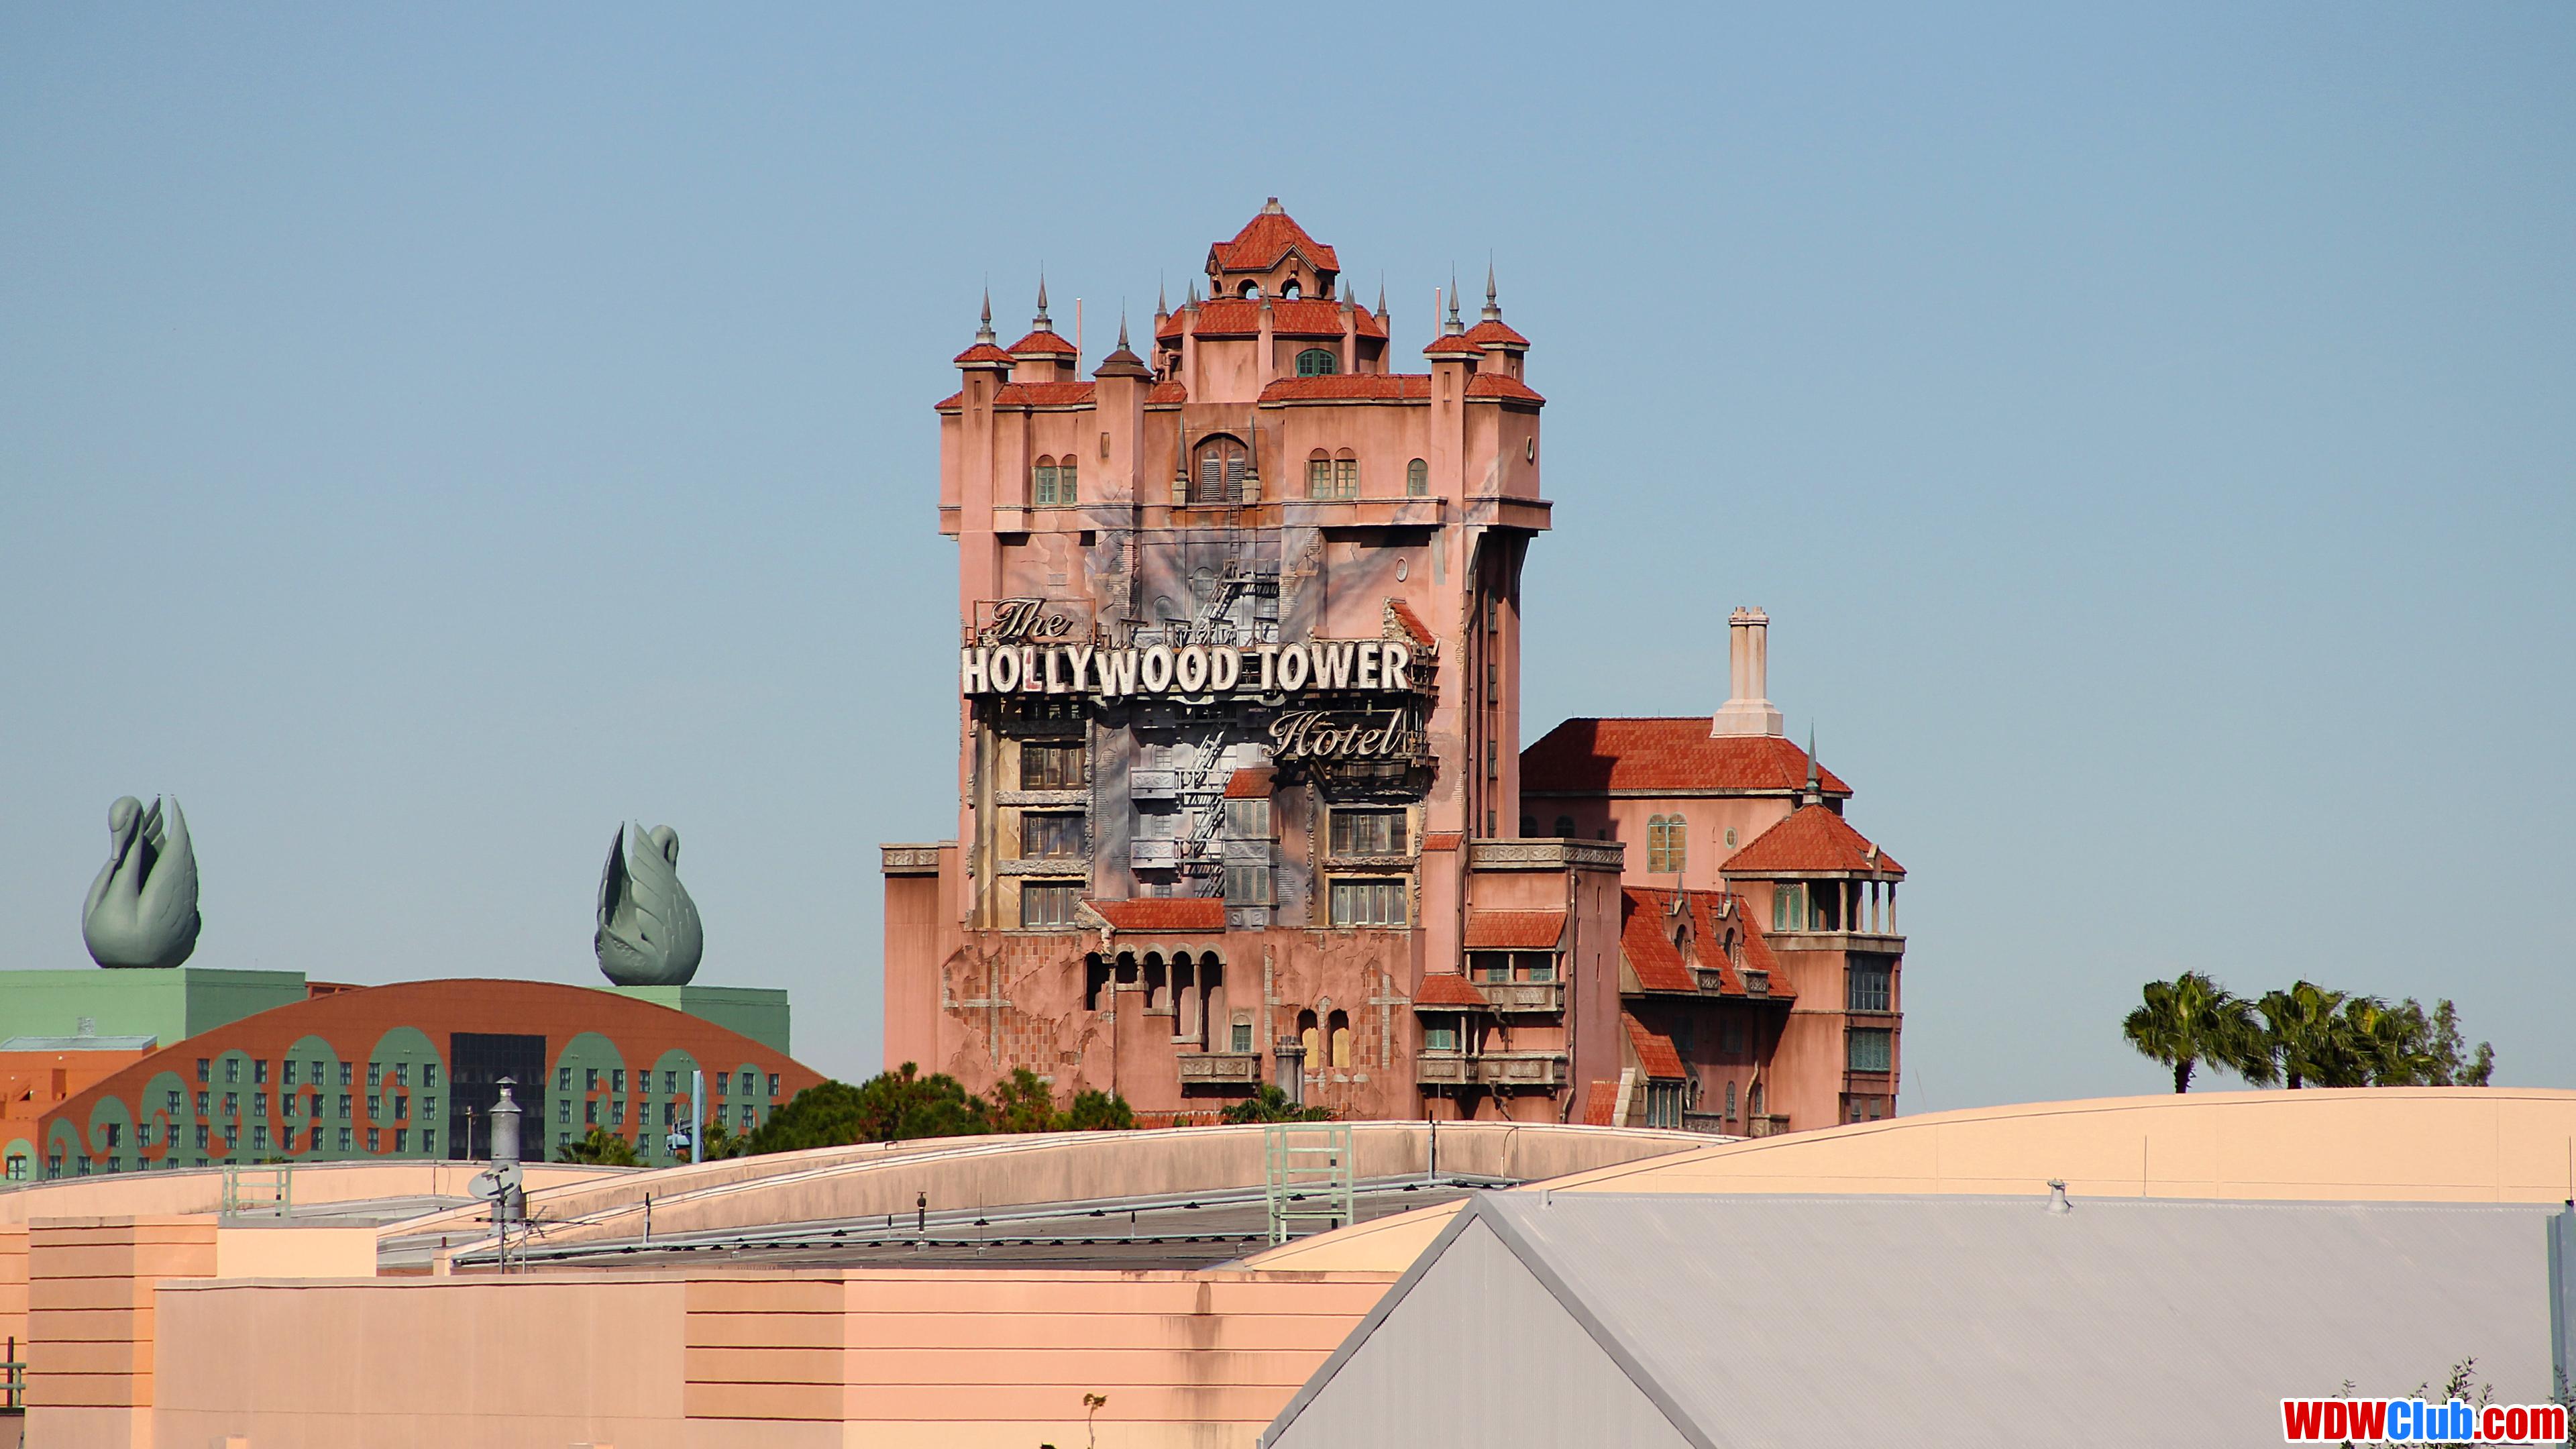 Disney World The Twilight Zone Tower Of Terror 3840x2160 Download Hd Wallpaper Wallpapertip